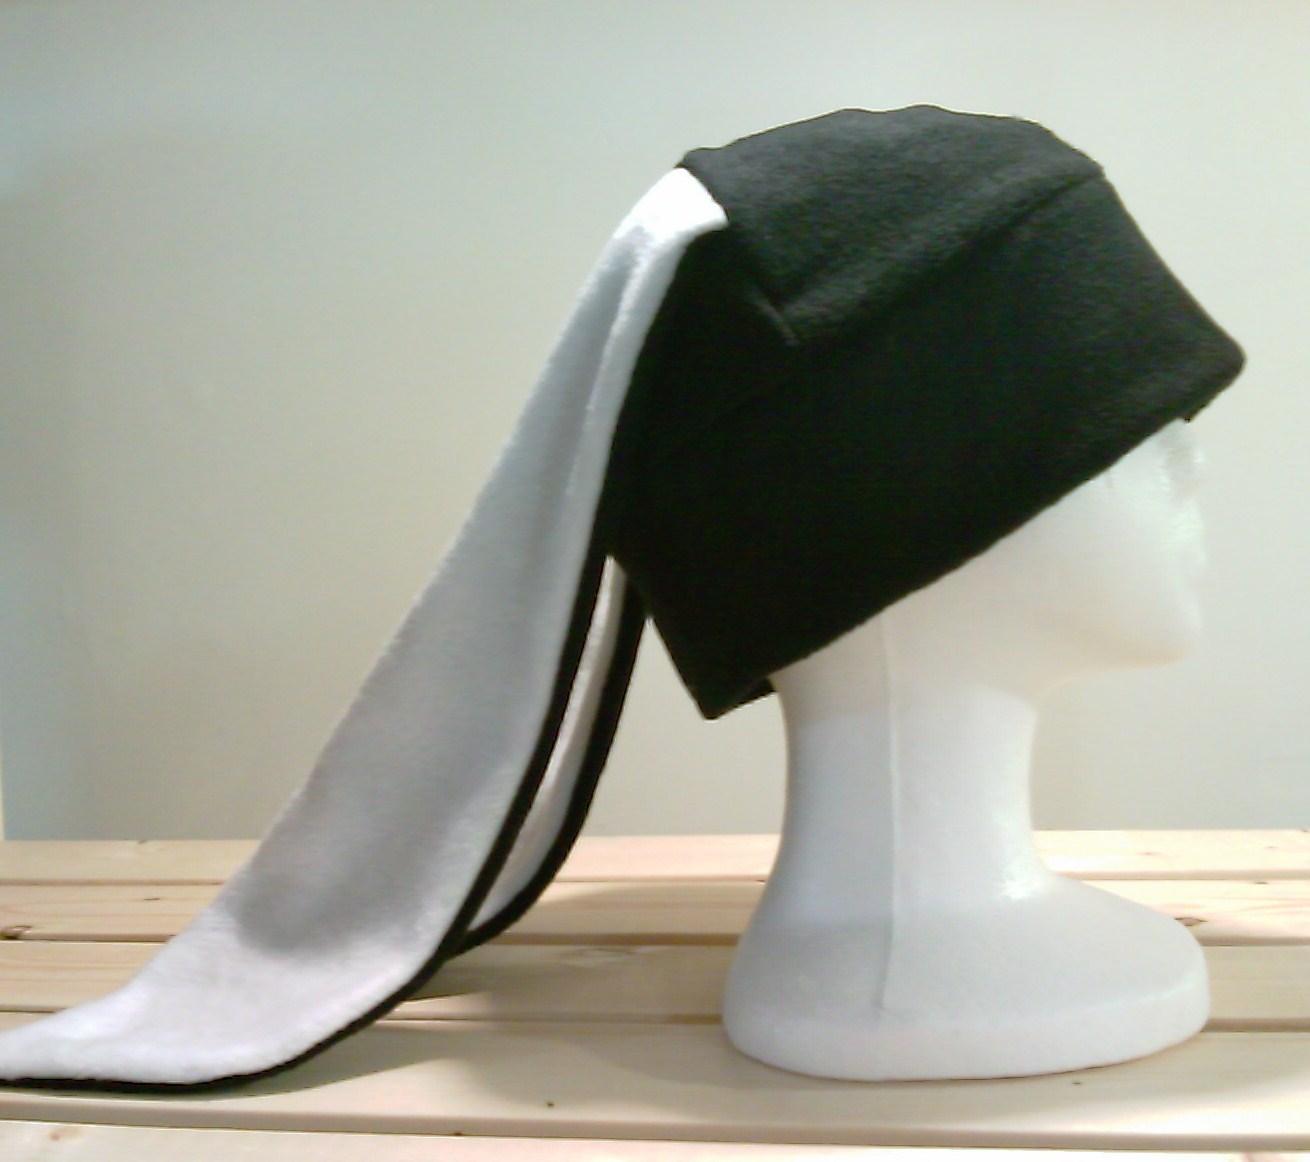 122a6caea Bunny Rabbit Ears - Bunny Fleece Hat - Rabbit Winter Hat - Bunny Cosplay  Hat - Bunny Hat - Black Rabbit Beanie - Rabbit Ear Hat